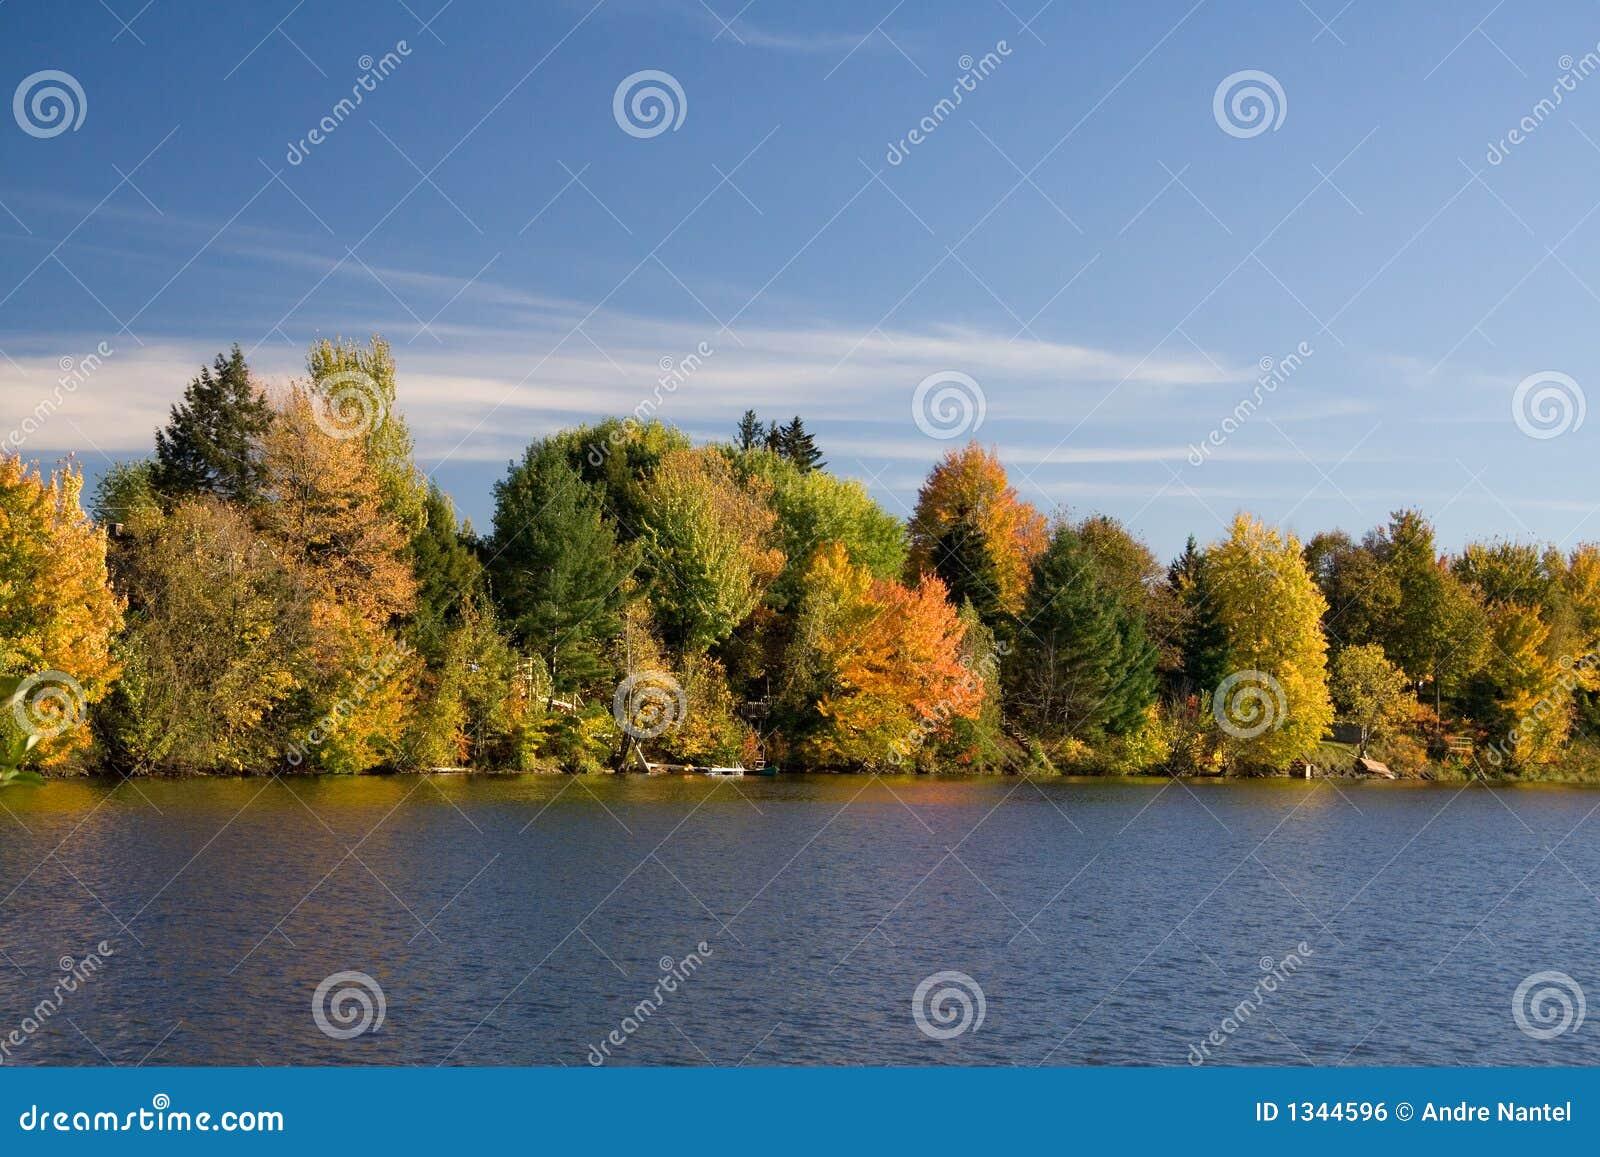 Upadek lakeside